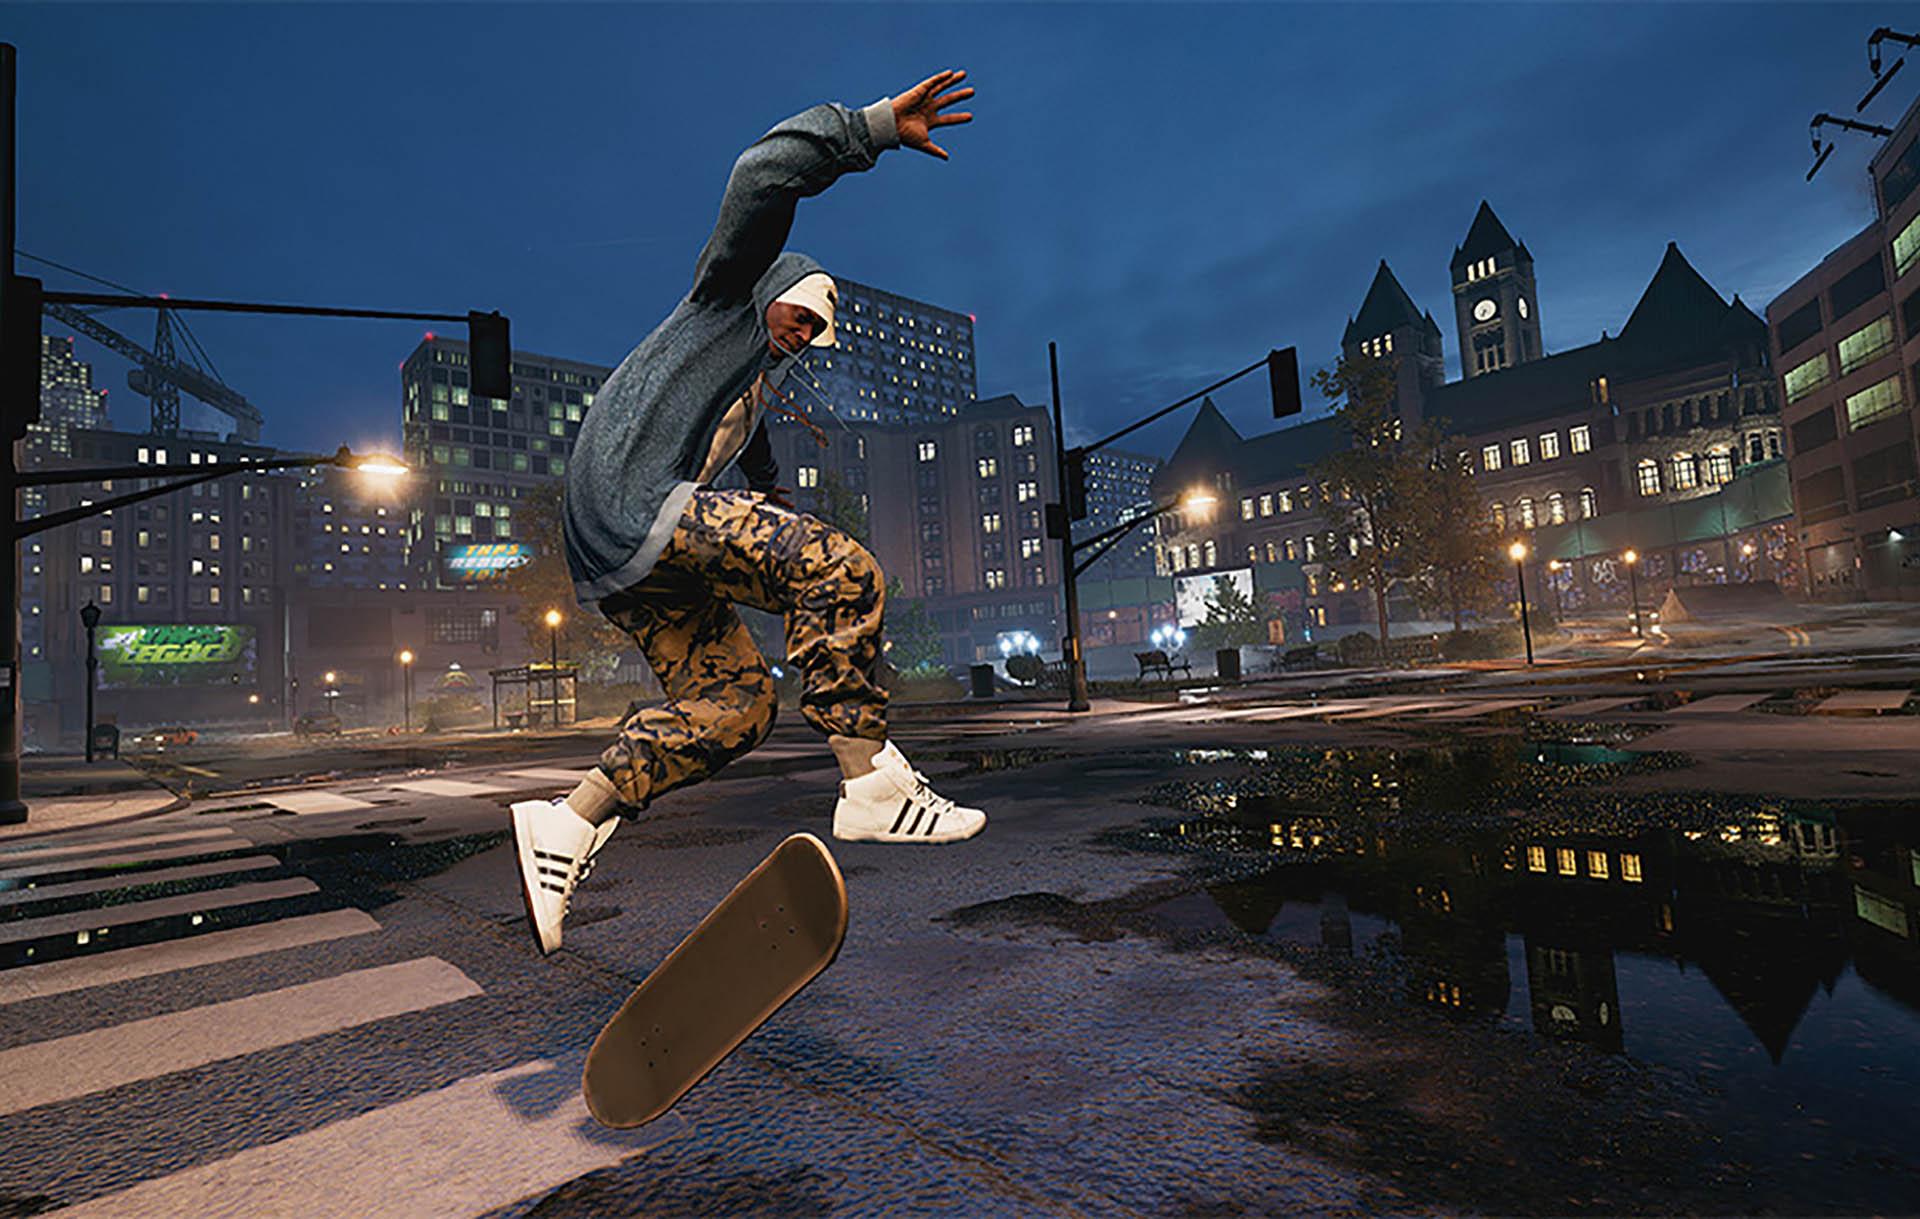 Tony Hawk Pro Skater 1 - Remastered